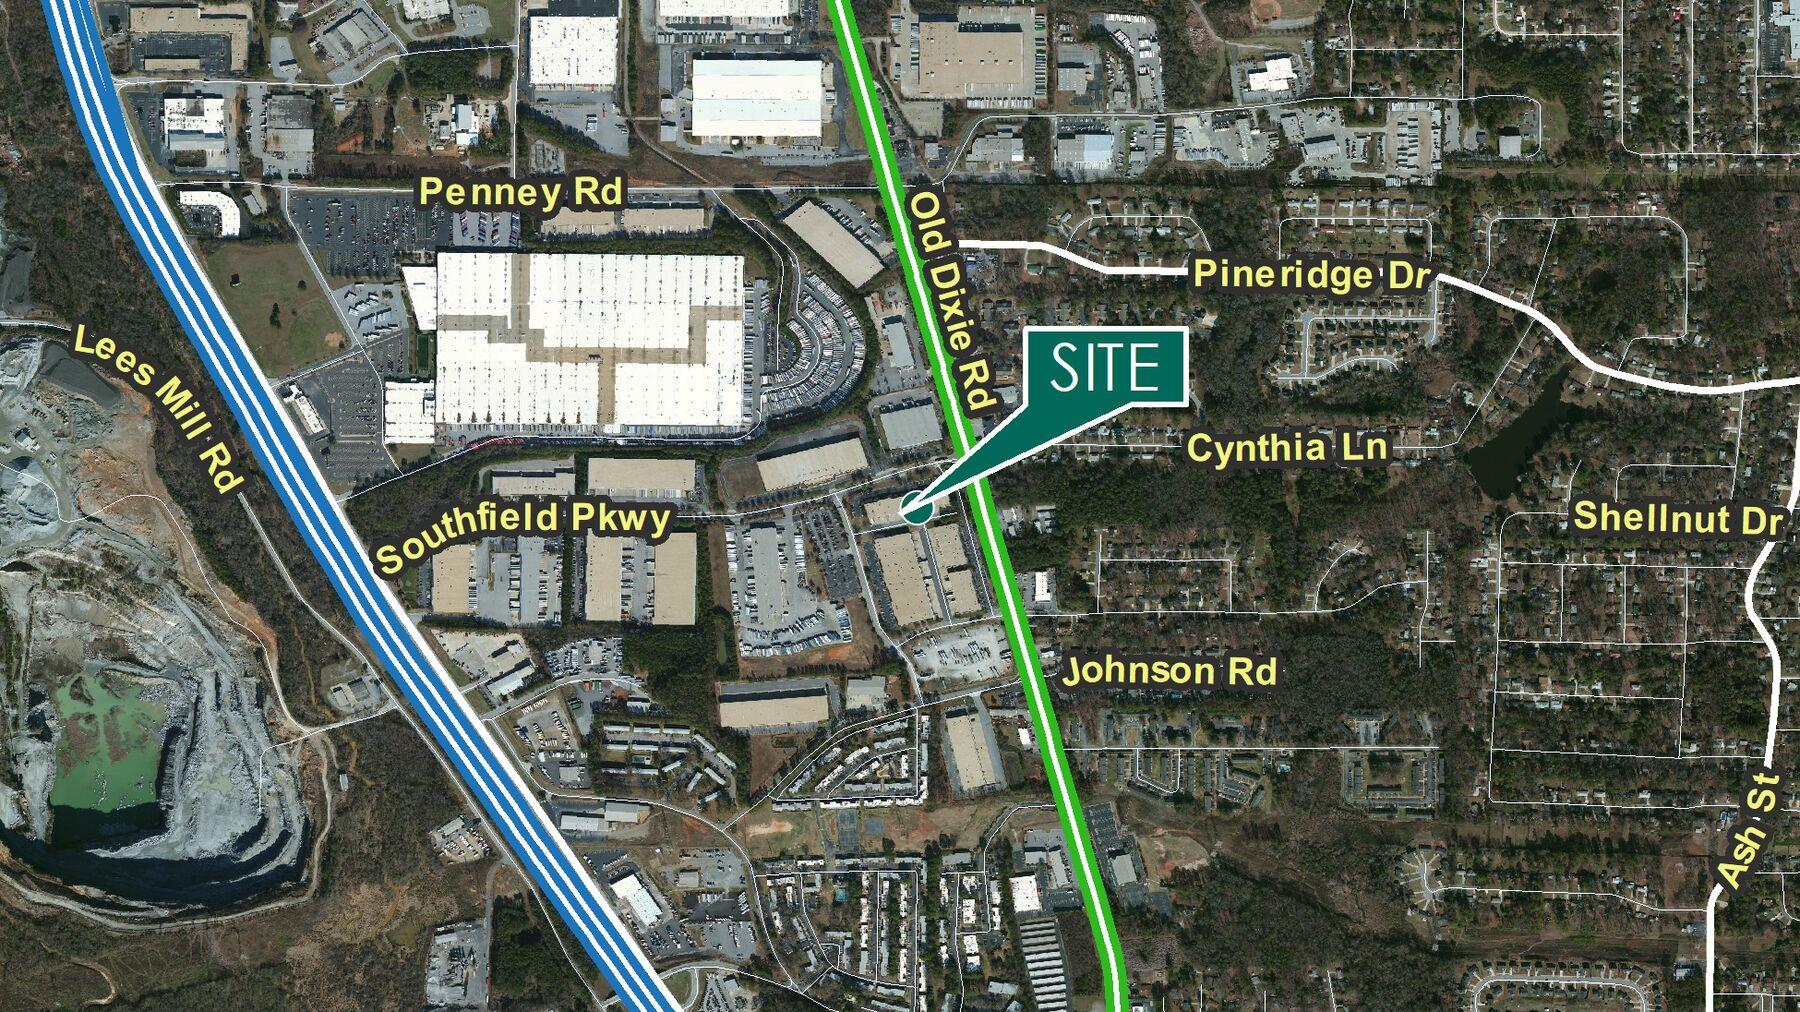 DPM-277-Southfield-Parkway-Aerial.jpg